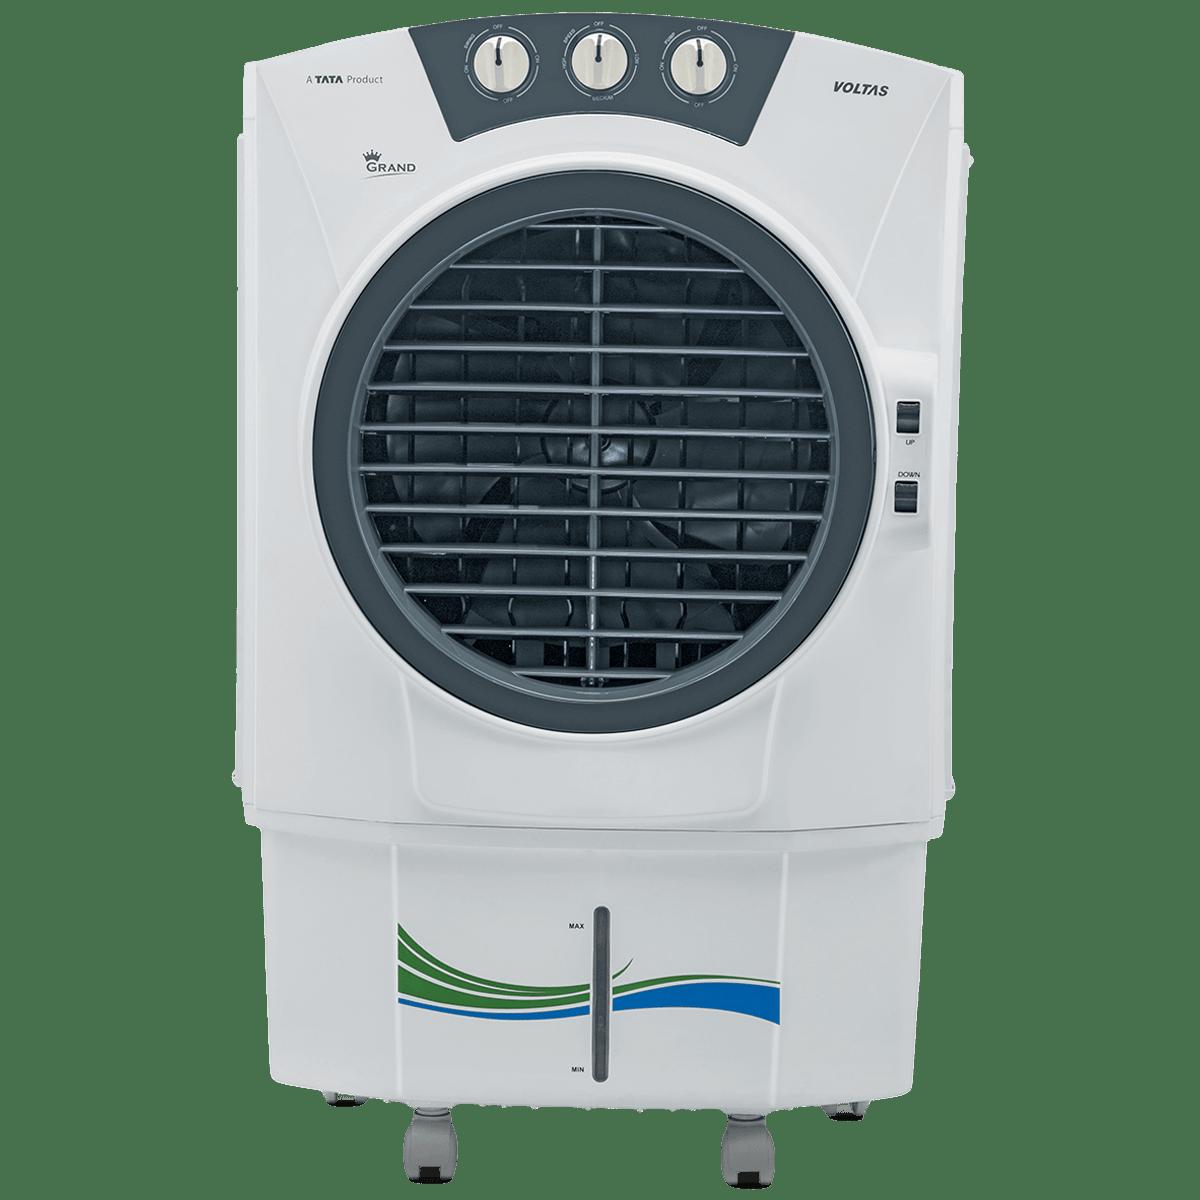 Voltas Grand 52 Litres Desert Air Cooler (Turbo Air Throw, White)